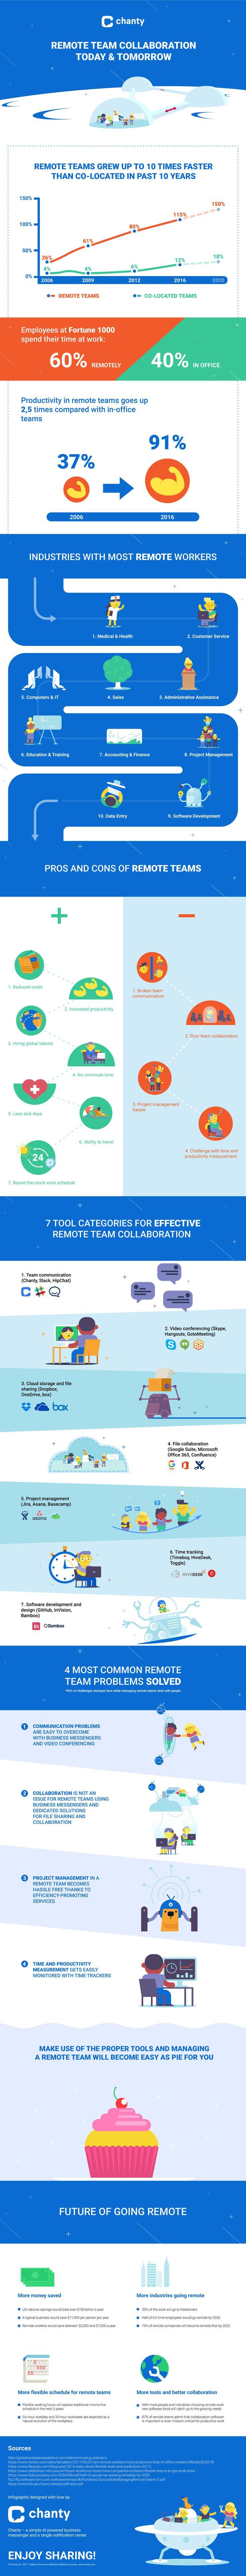 Remote Team Collaboration Today & Tomorrow